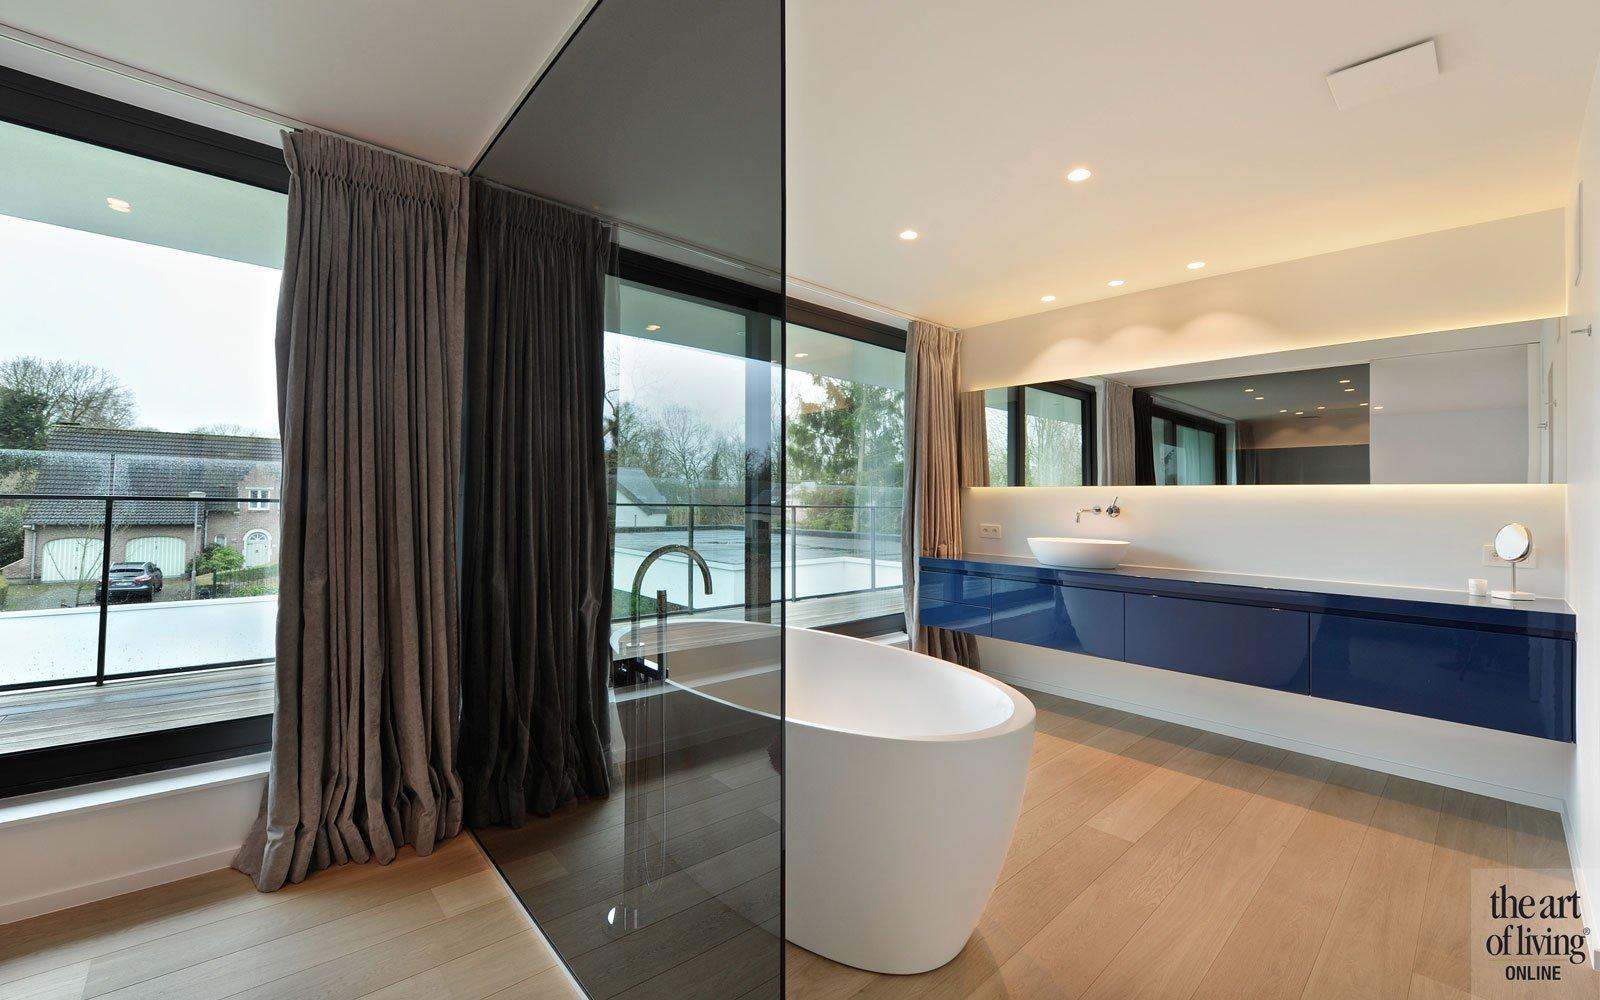 Badkamer, slaapkamer, glazen wand, vrijstaand bad, wastafel, sanitair, houten vloer, eigentijdse villa, Schellen Architecten